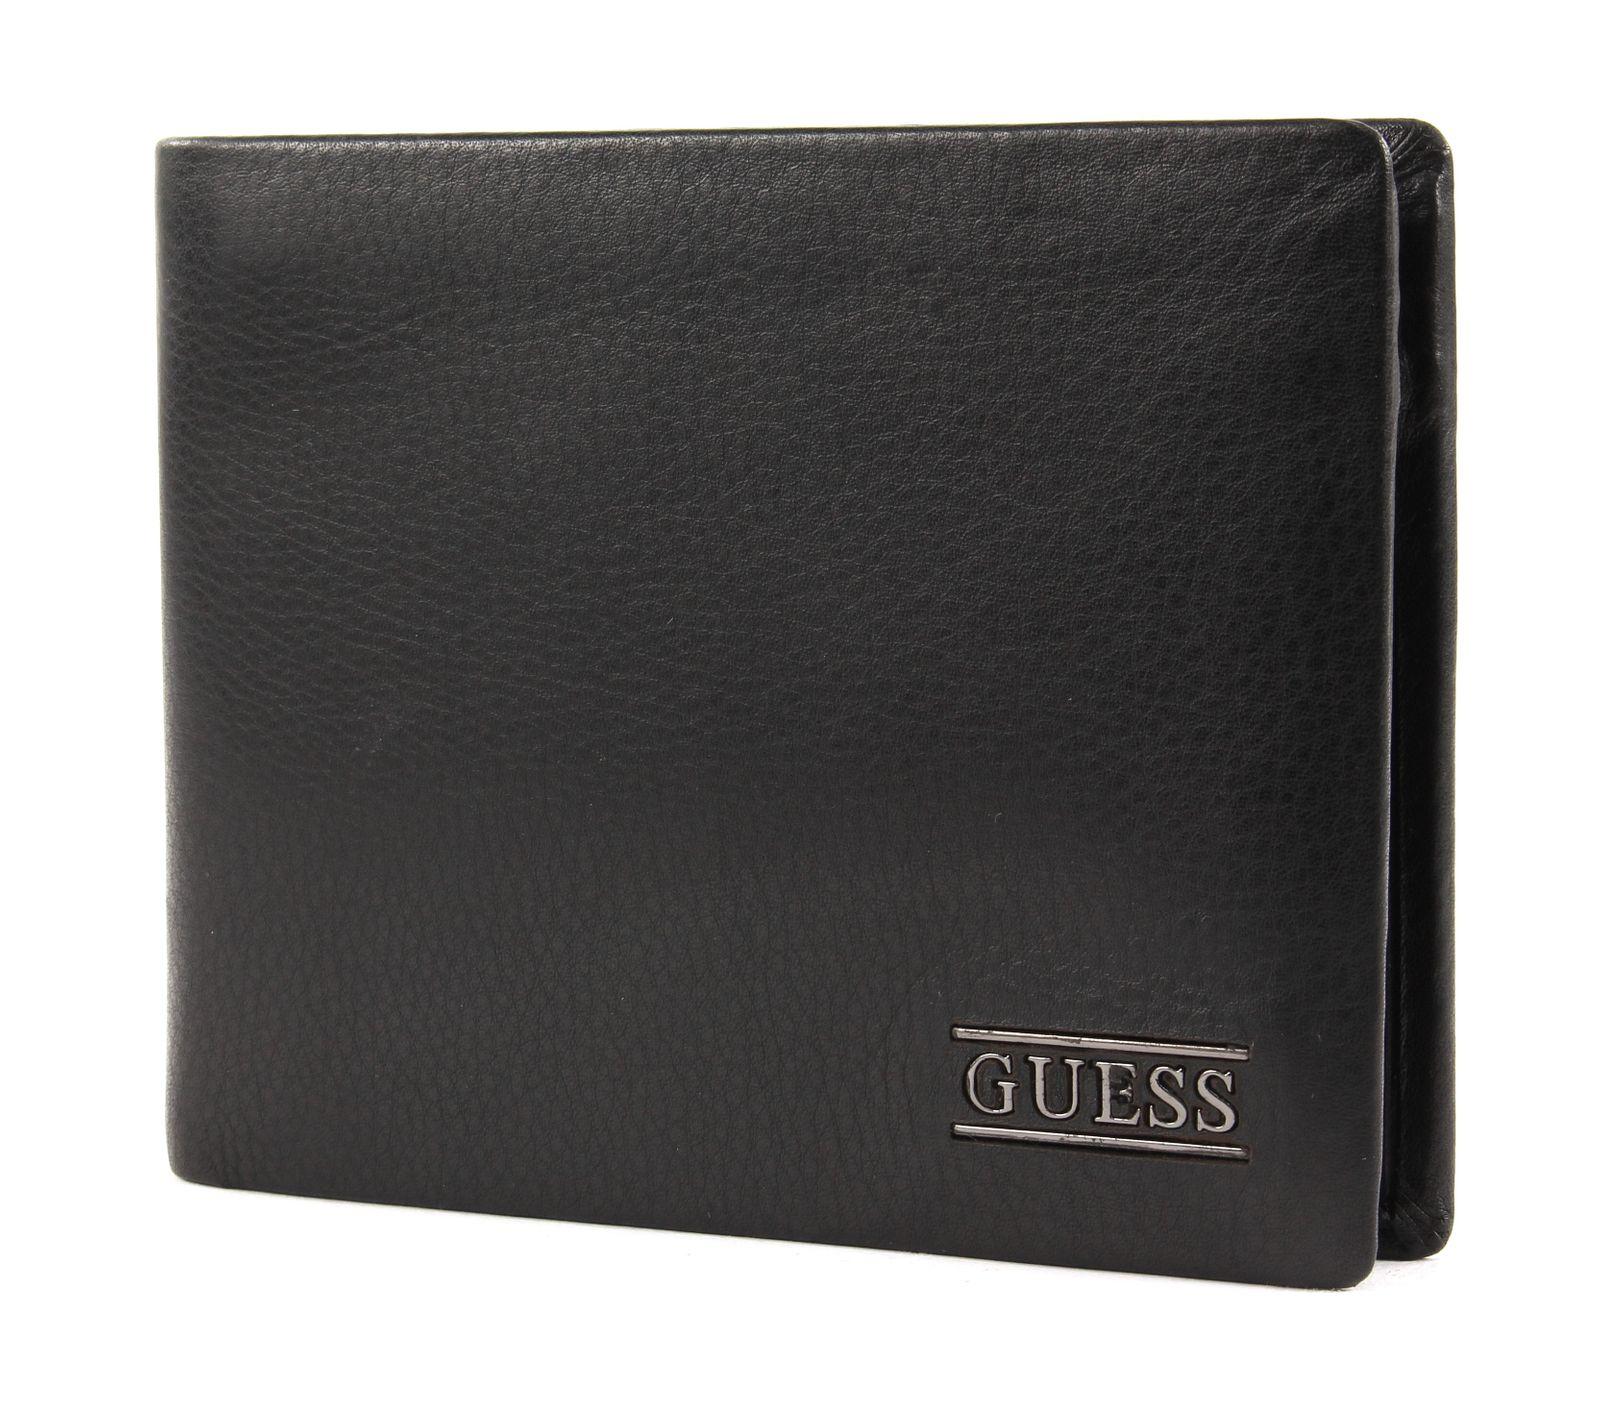 GUESS New Boston Billfold Coin Wallet Black